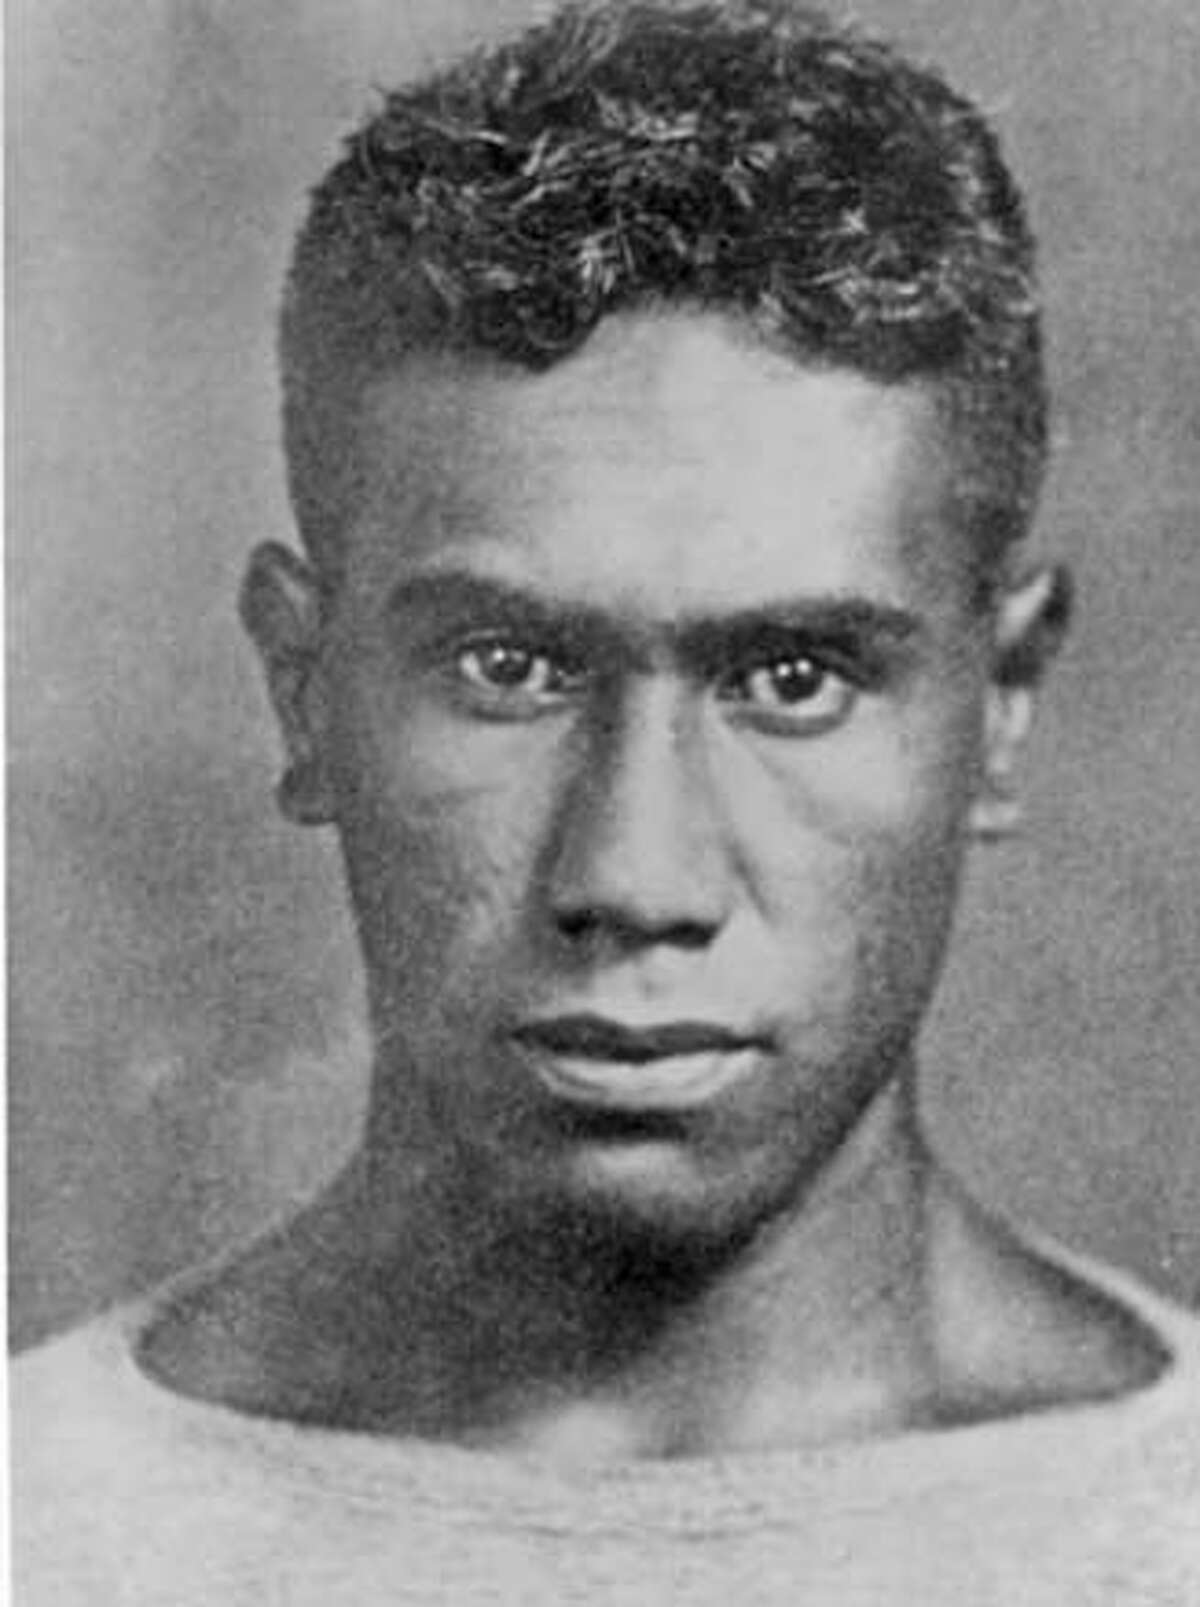 Mugshot of Joseph Kahahawai Jr. after his arrest in the alleged rape of Thalia Massie.